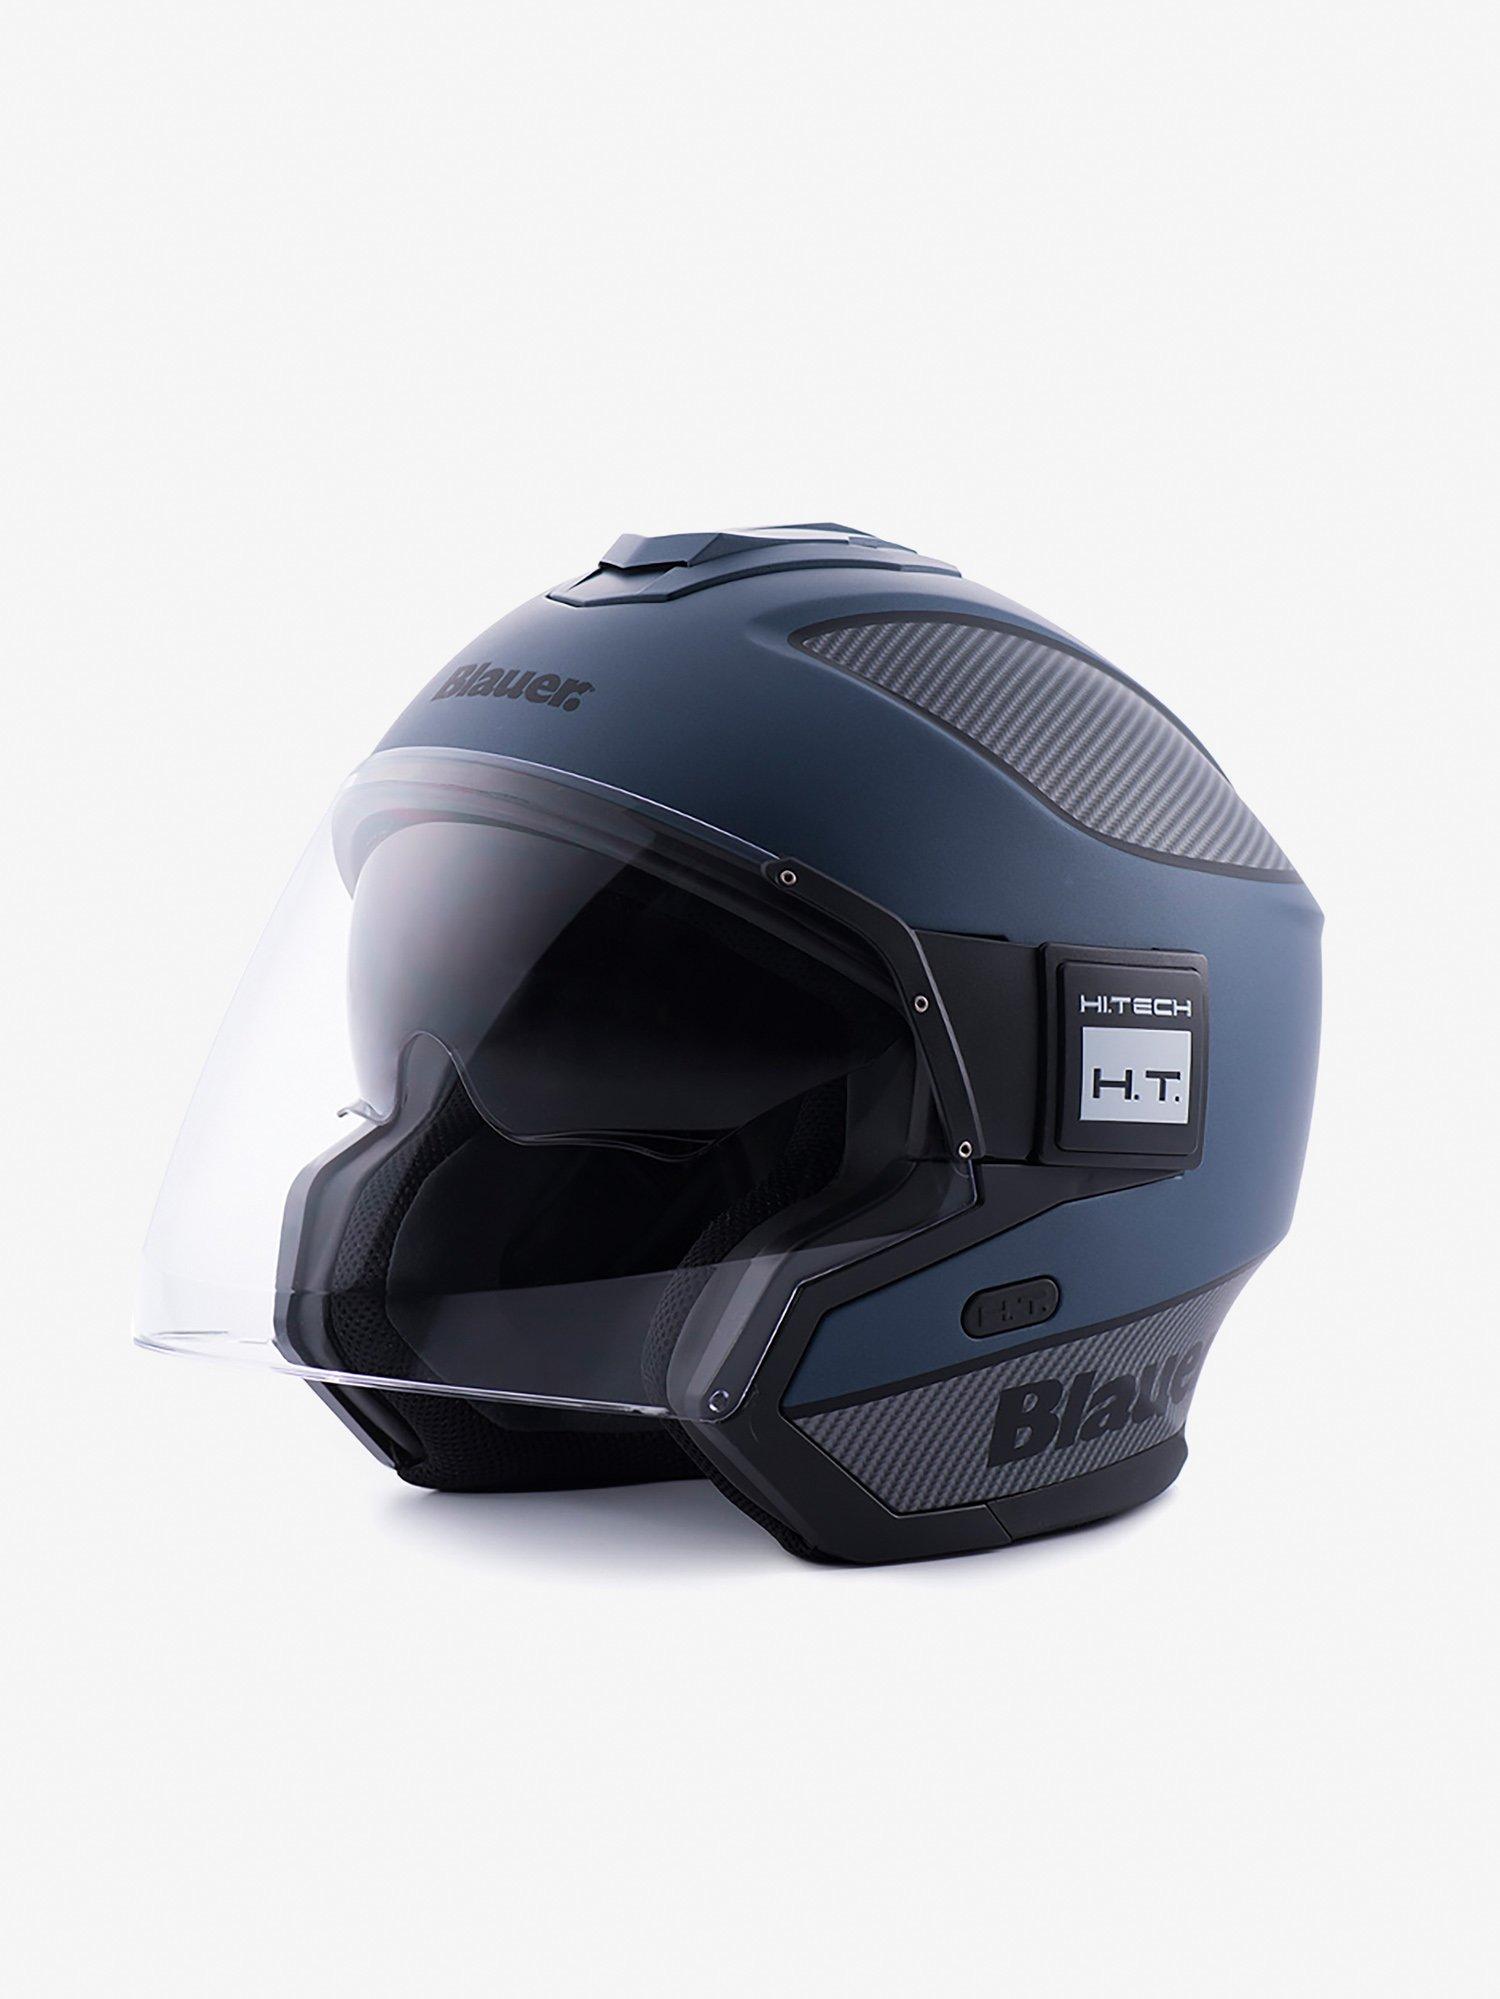 Blauer - JET SOLO HELMET - Blue / Carbon / Black Matt - Blauer